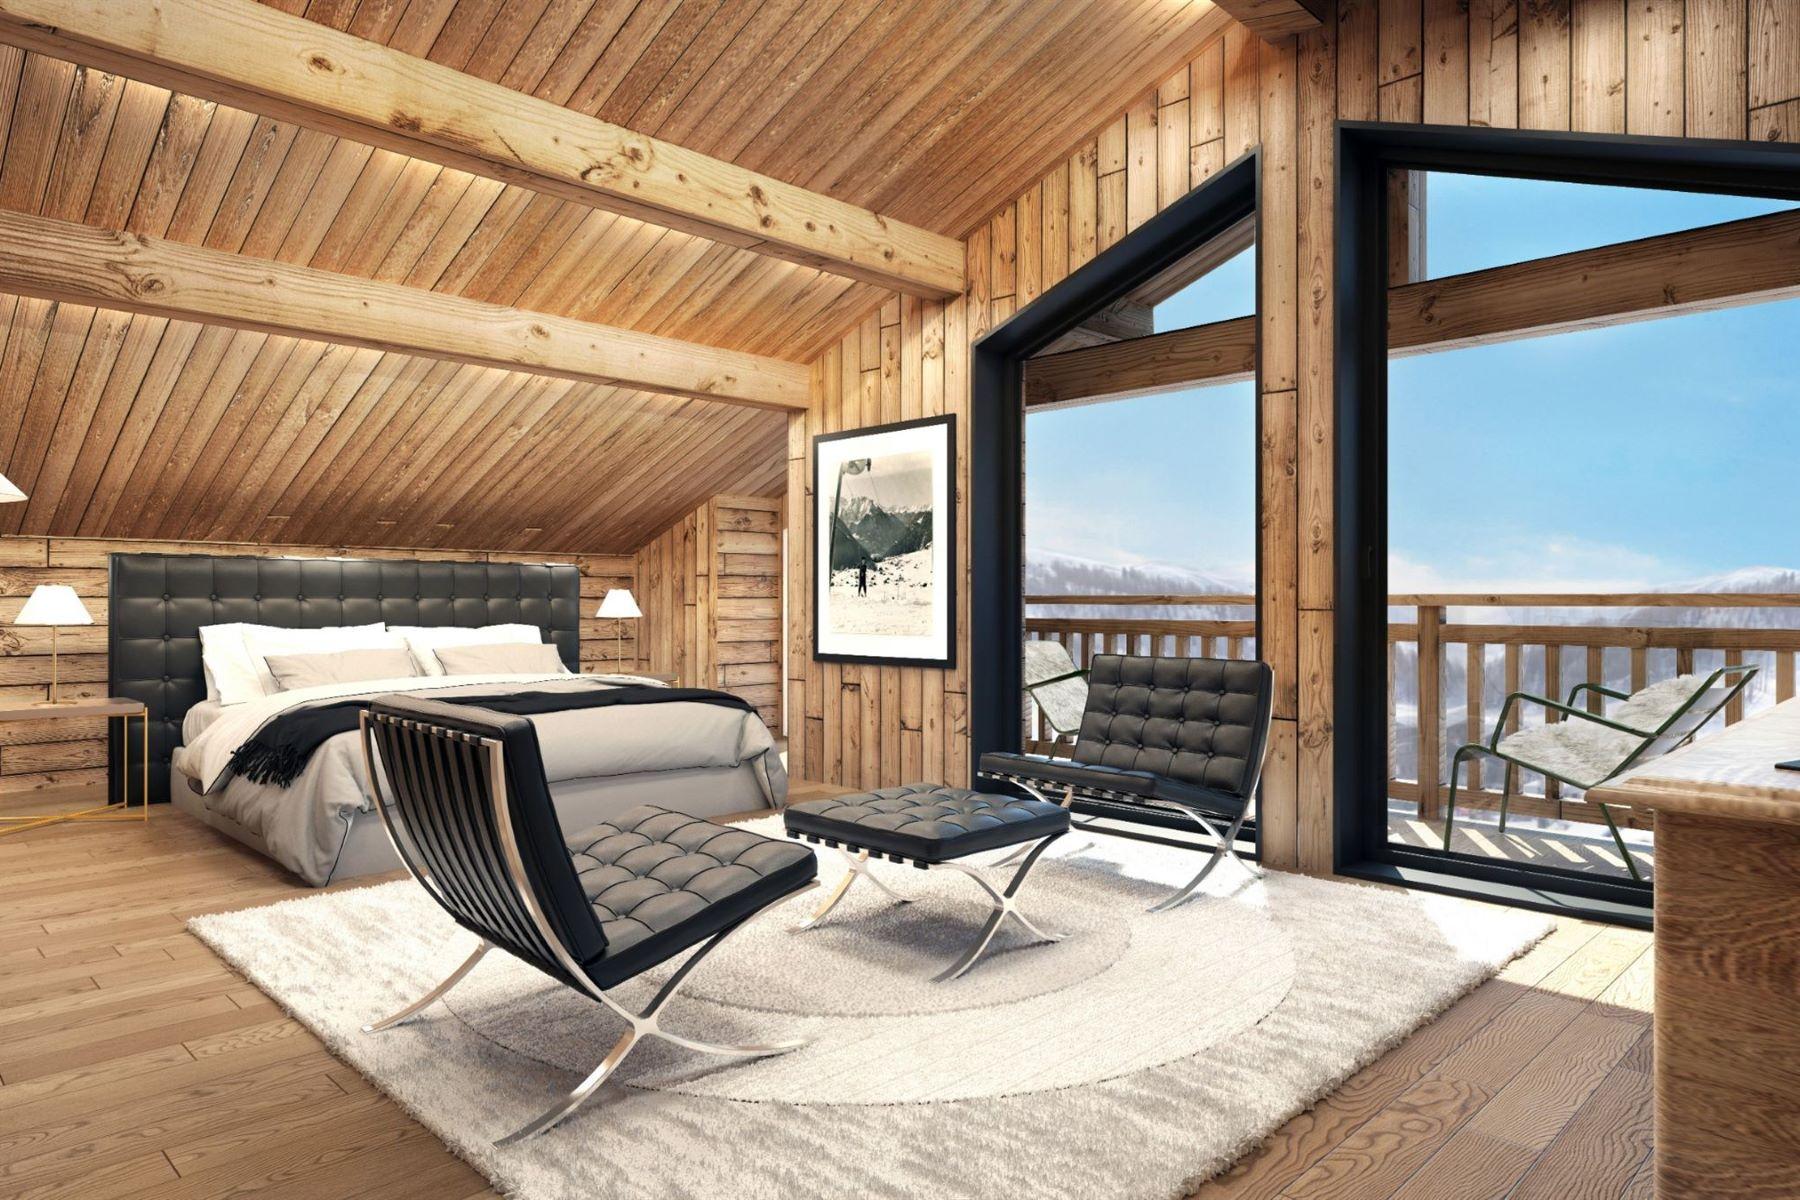 Apartment for Sale at EXCLUSIVITE - GYPAETE – NEW PROGRAM – MEGEVE Megeve, Rhone-Alpes 74120 France